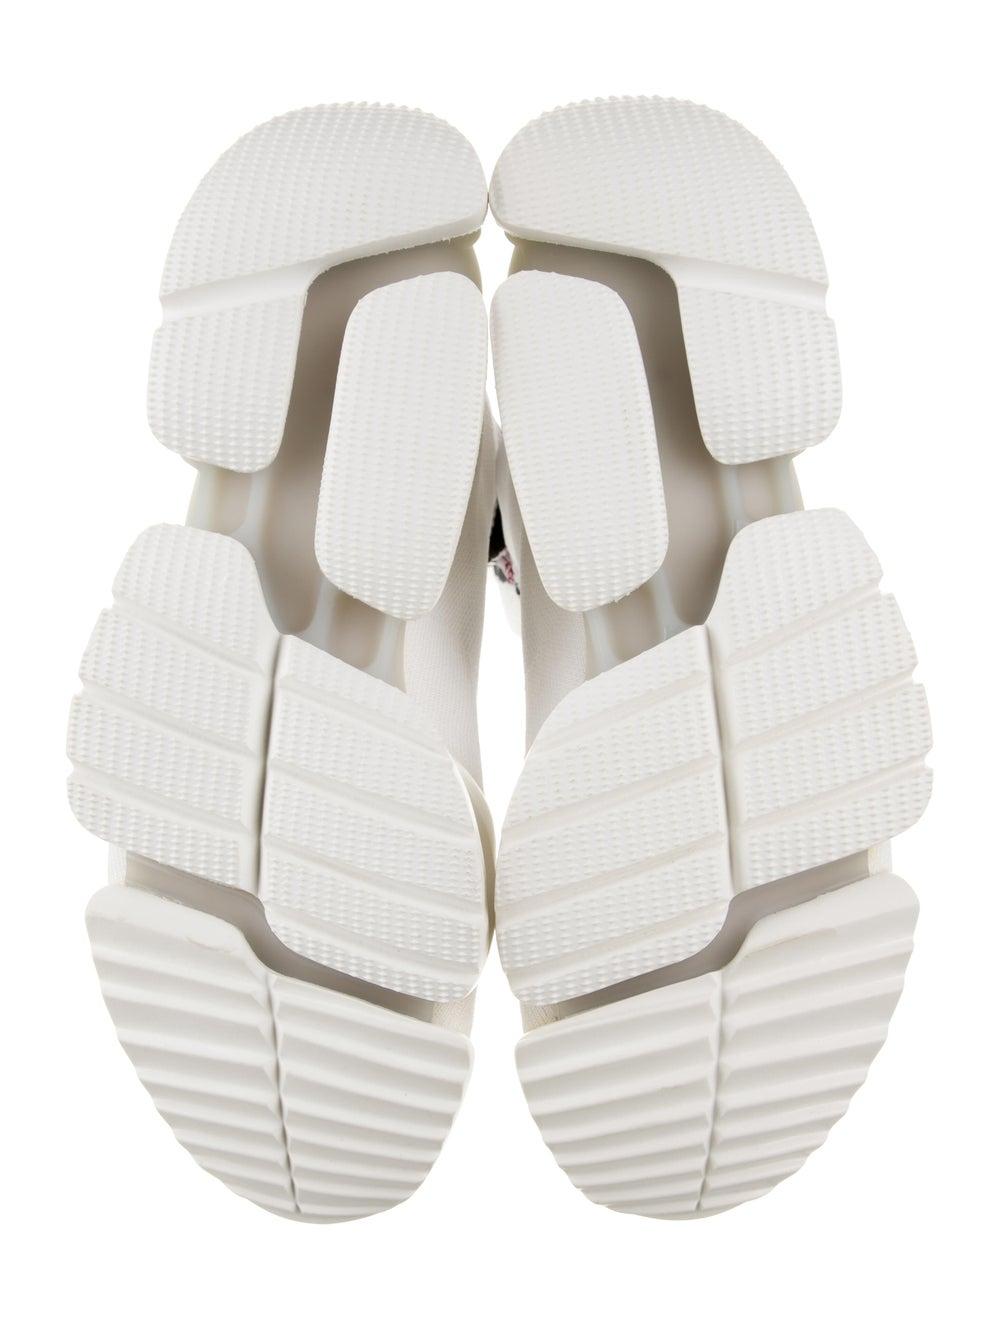 Vetements x Reebok Sock Pump Sock Sneakers White - image 5